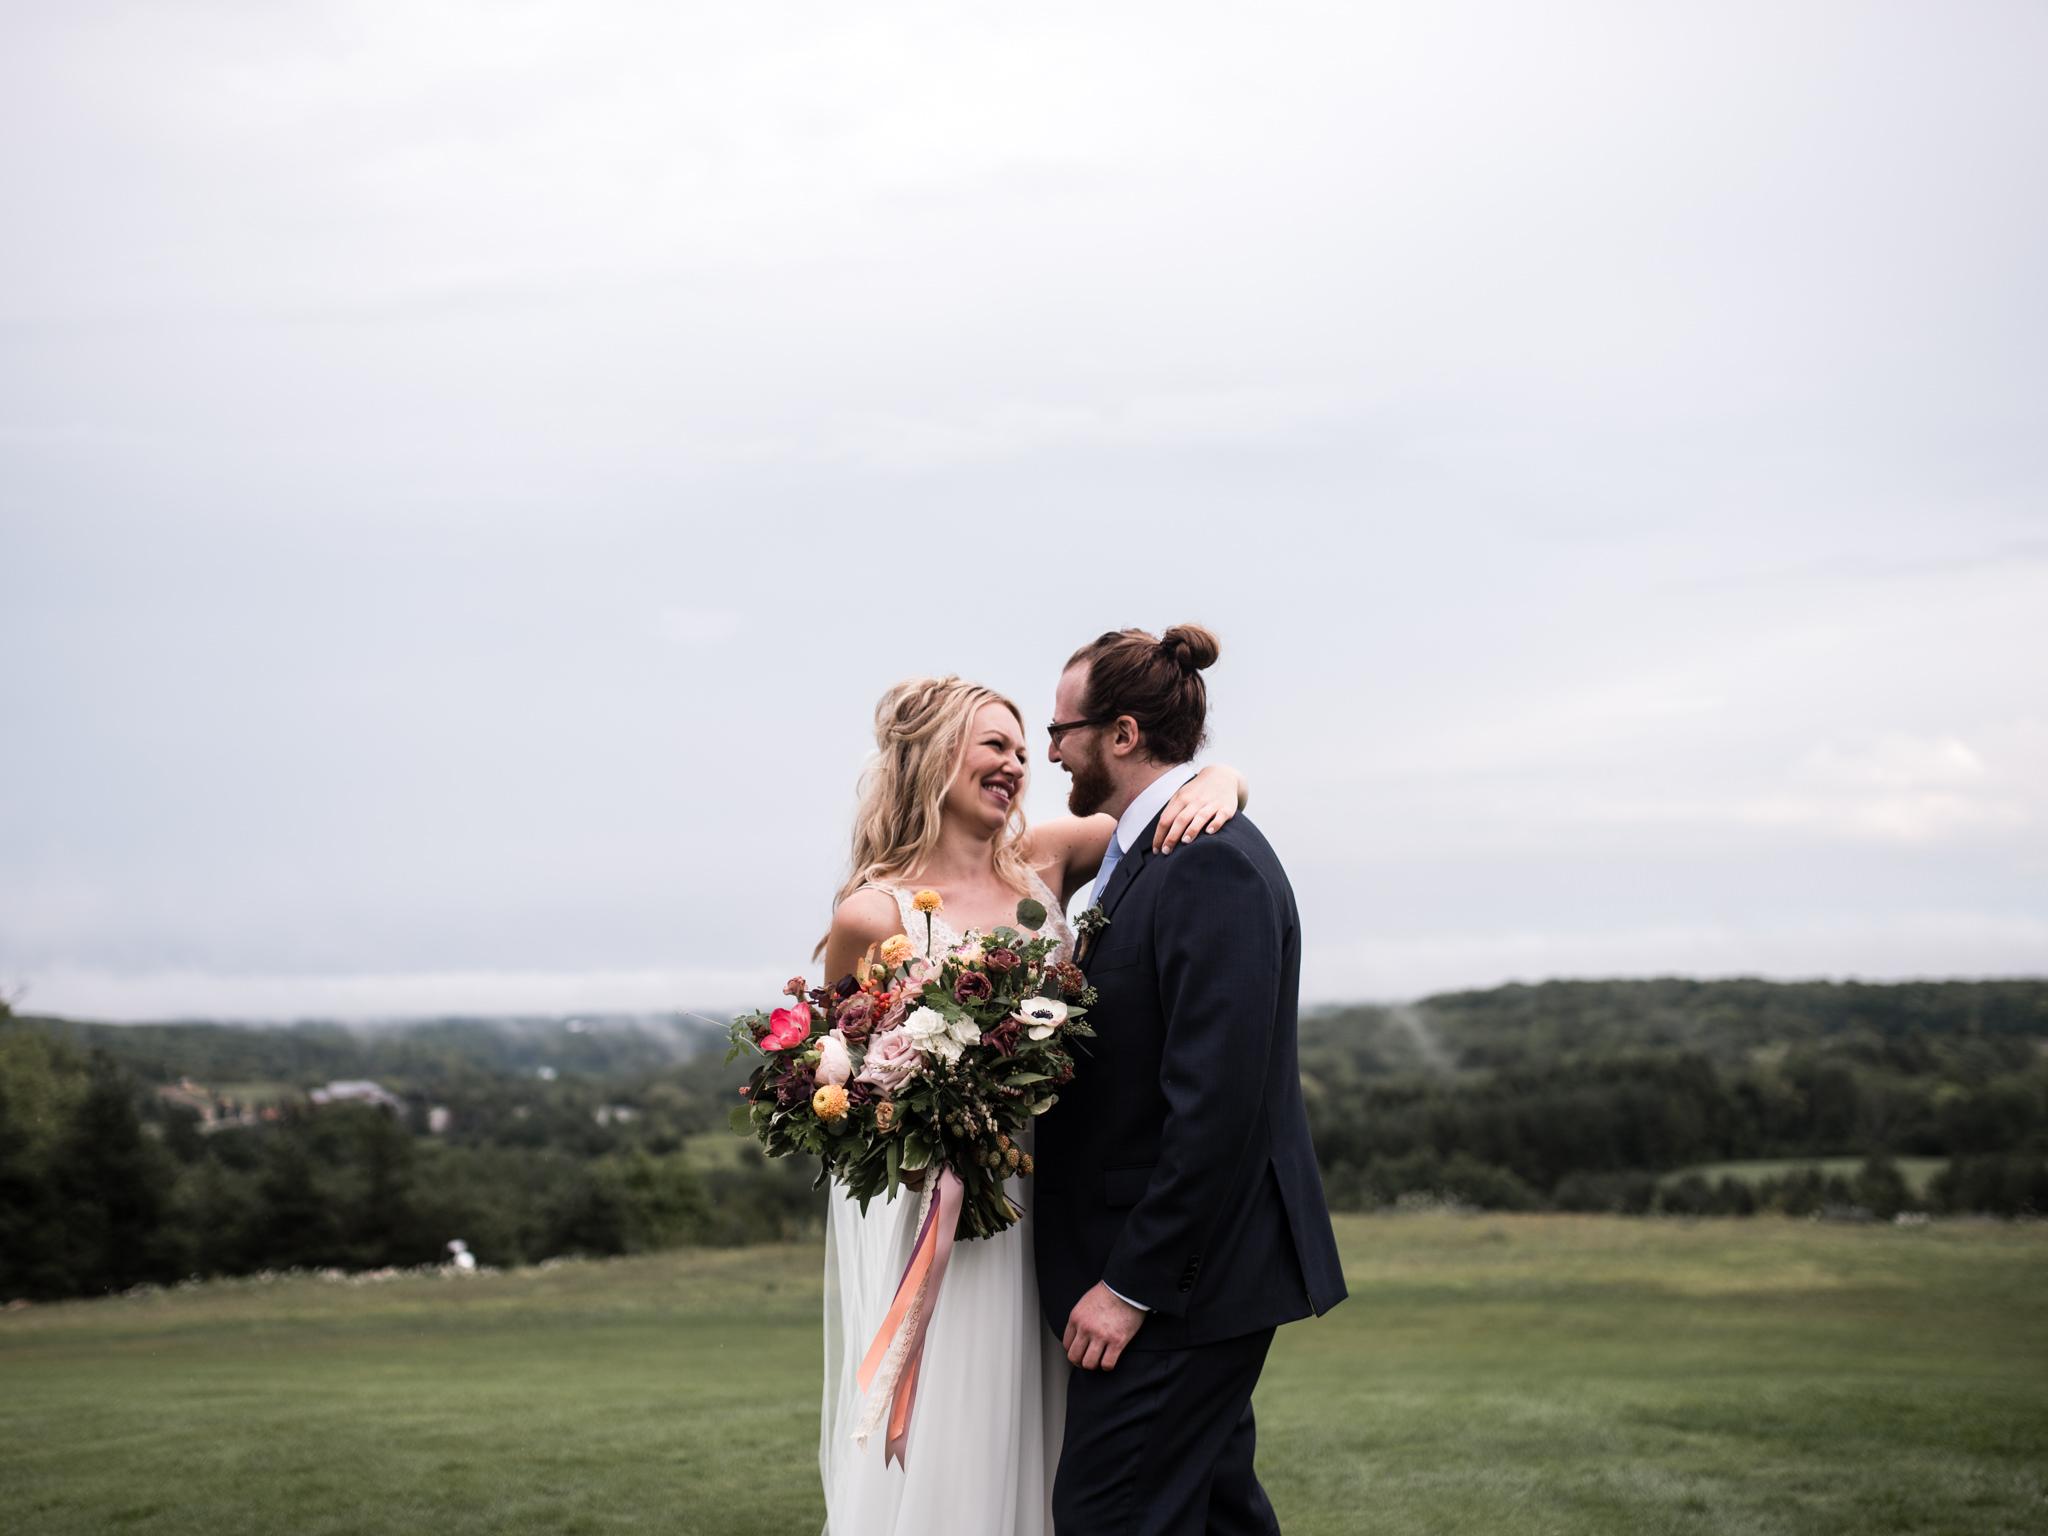 skyloft-wedding-toronto-wedding-photographer-26.jpg